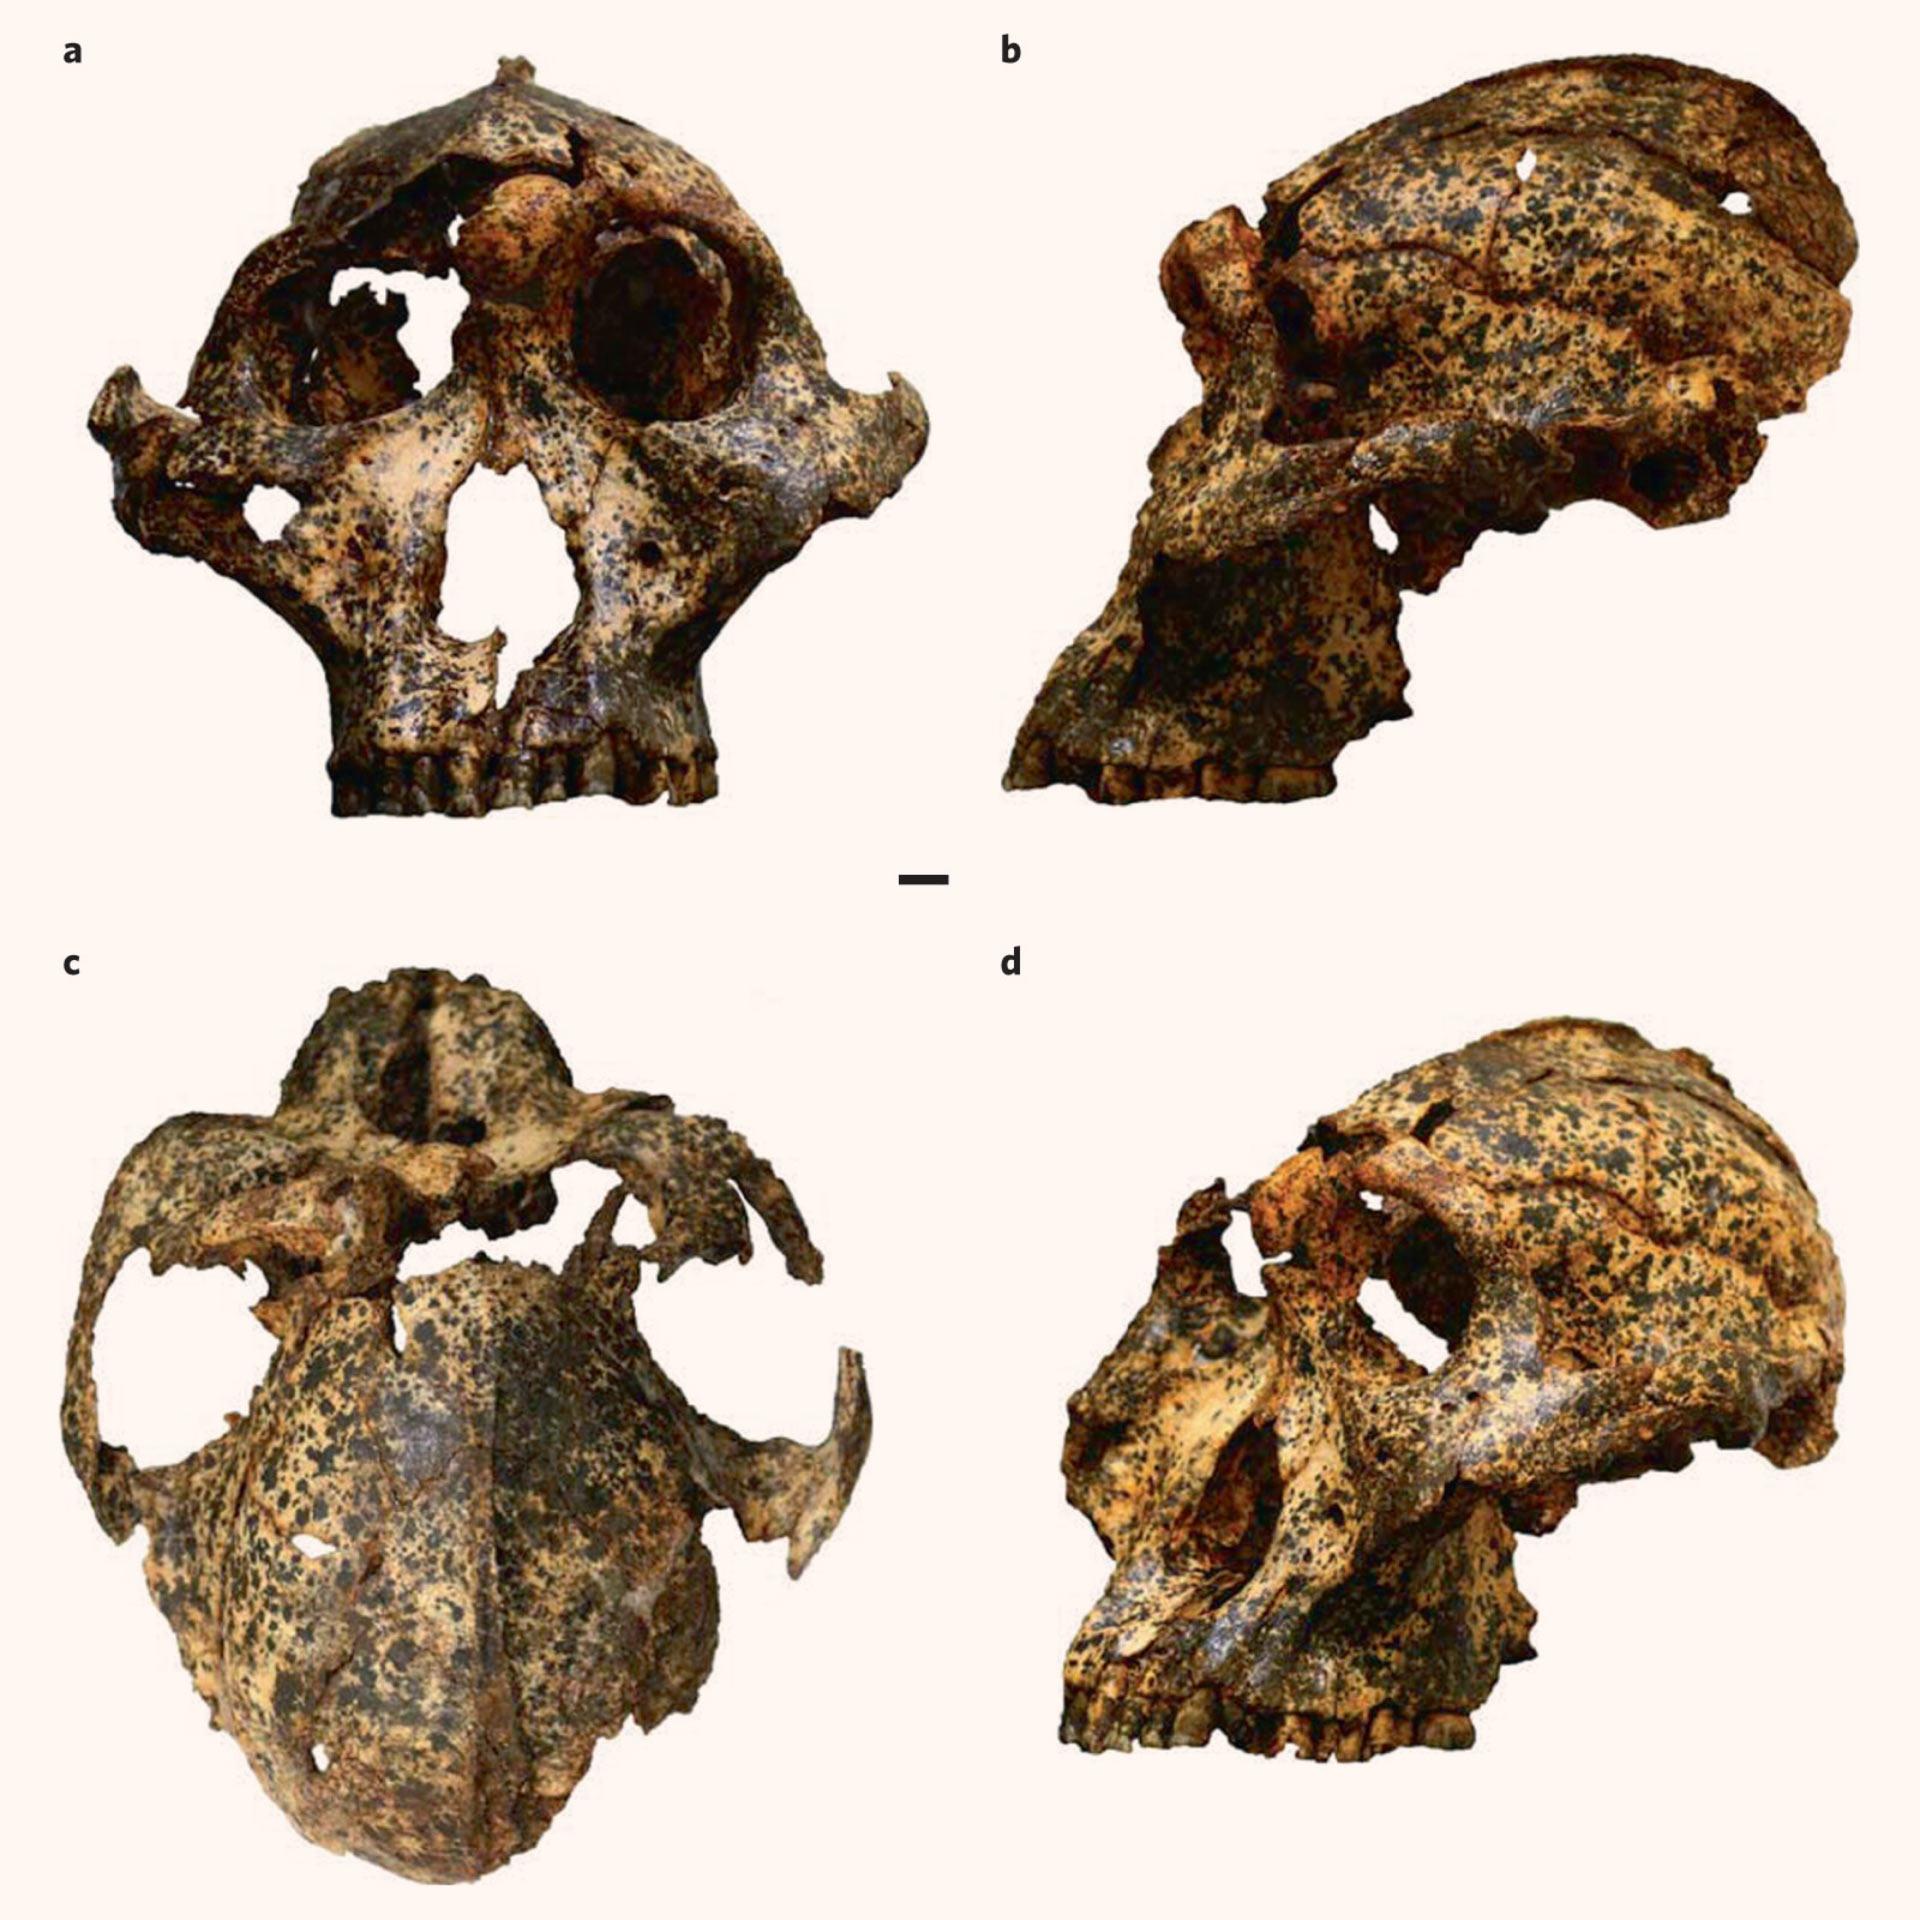 image e Paranthropus robustus